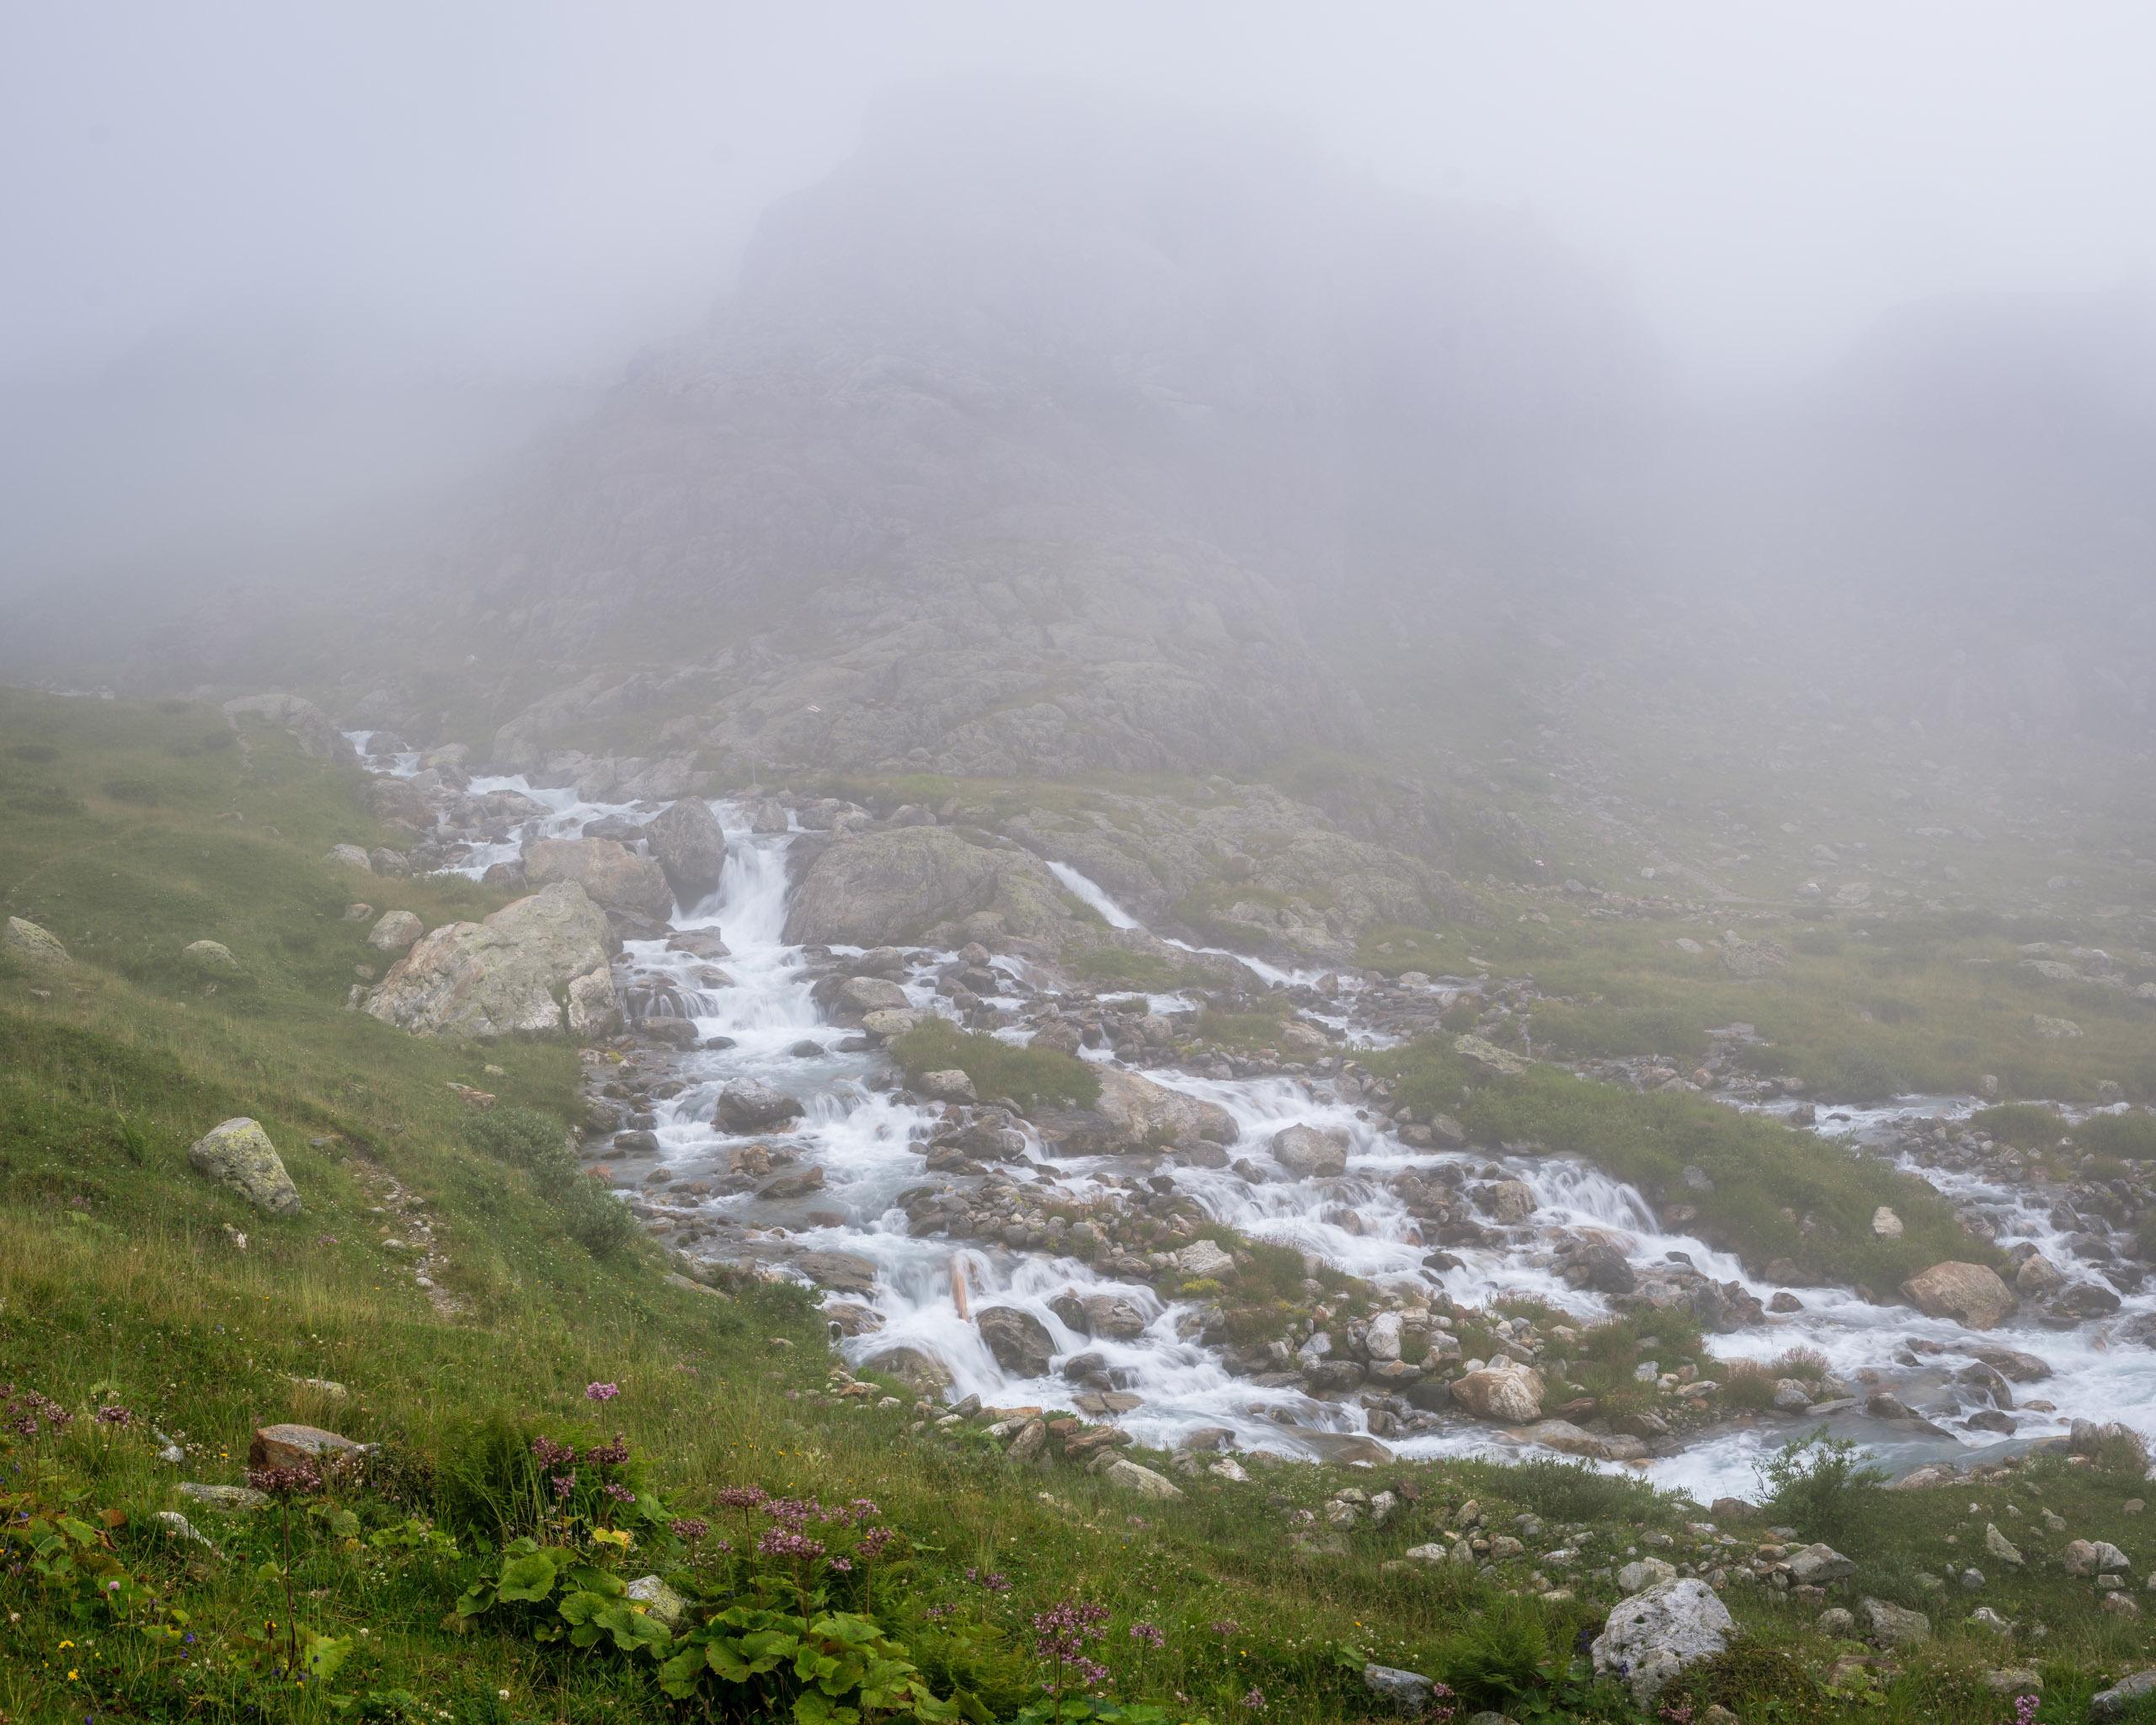 Unnamed glacial runoff, Steingletscher